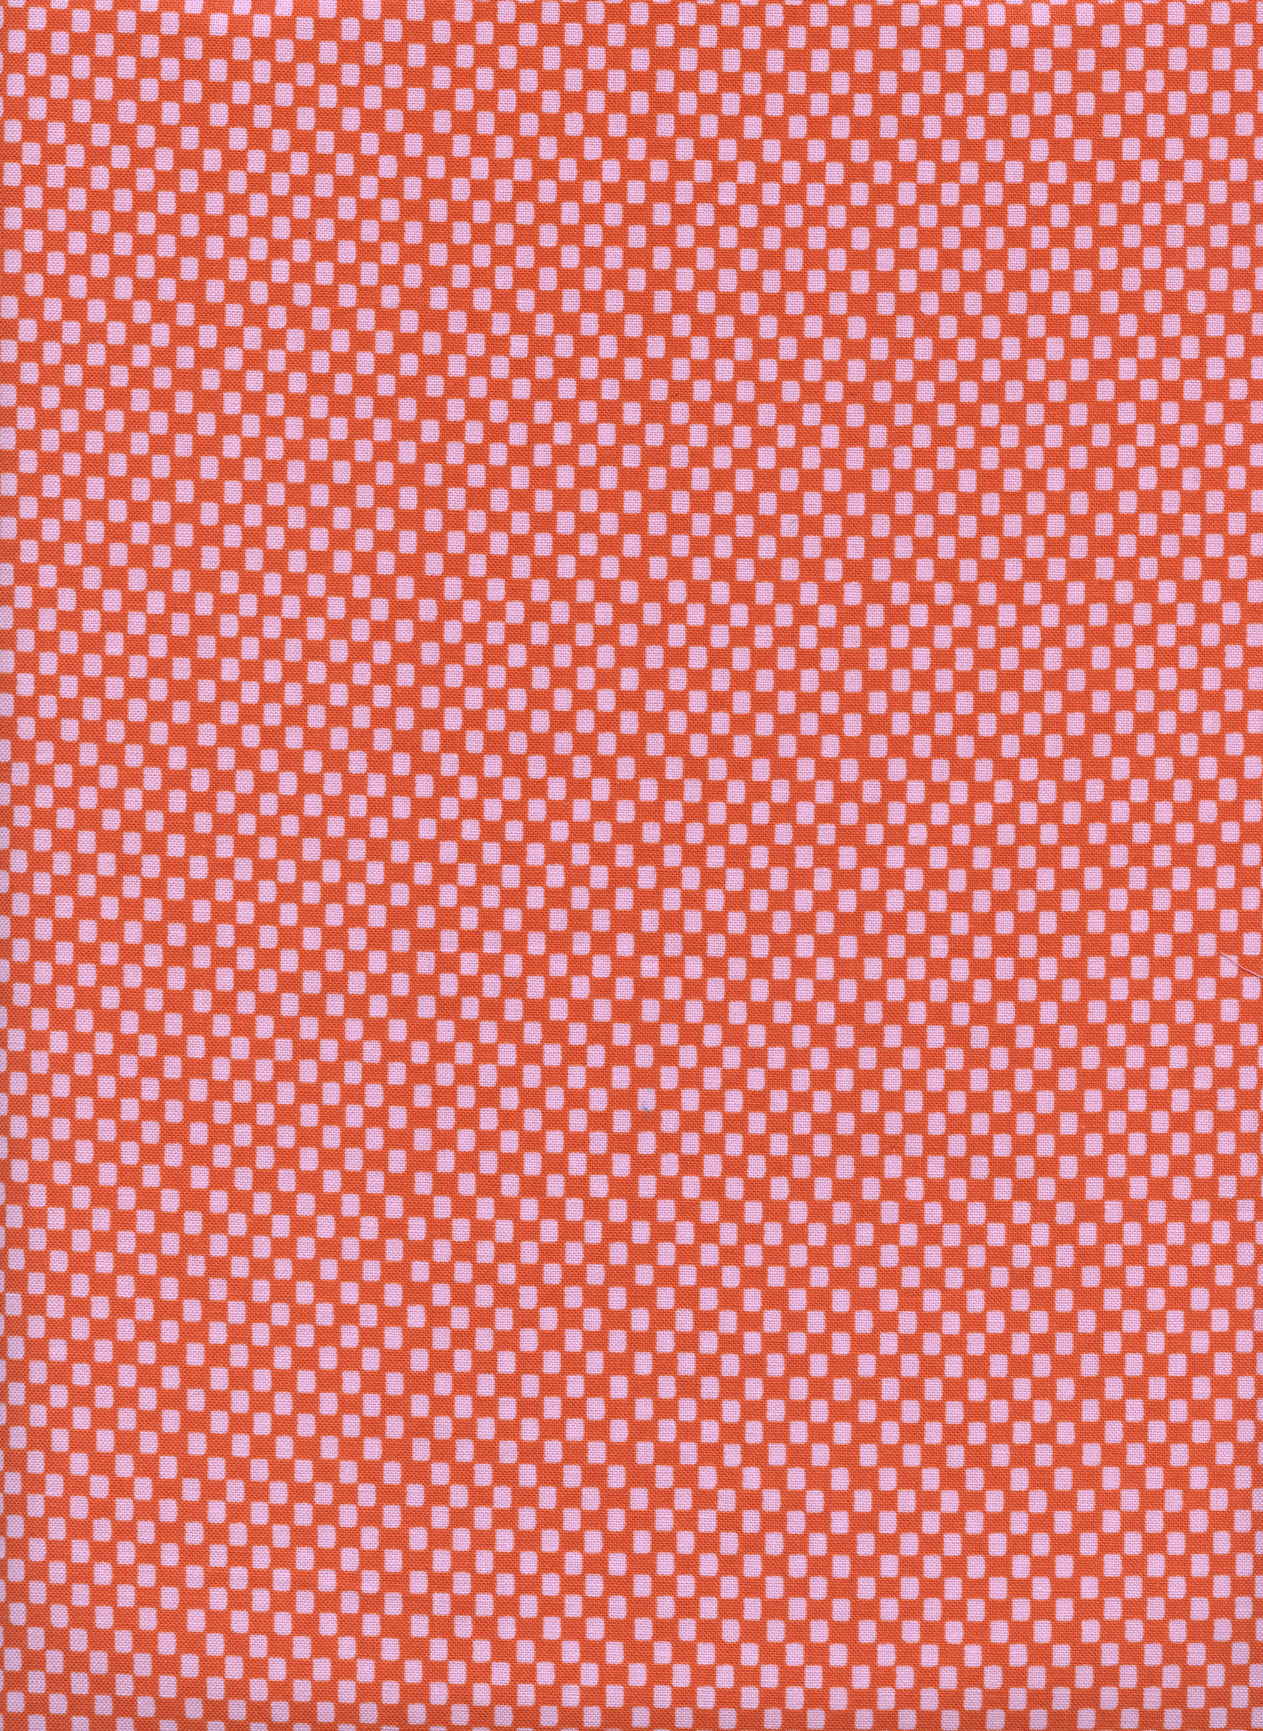 Rifle Paper Co. Amalfi - Checkers (Pink)